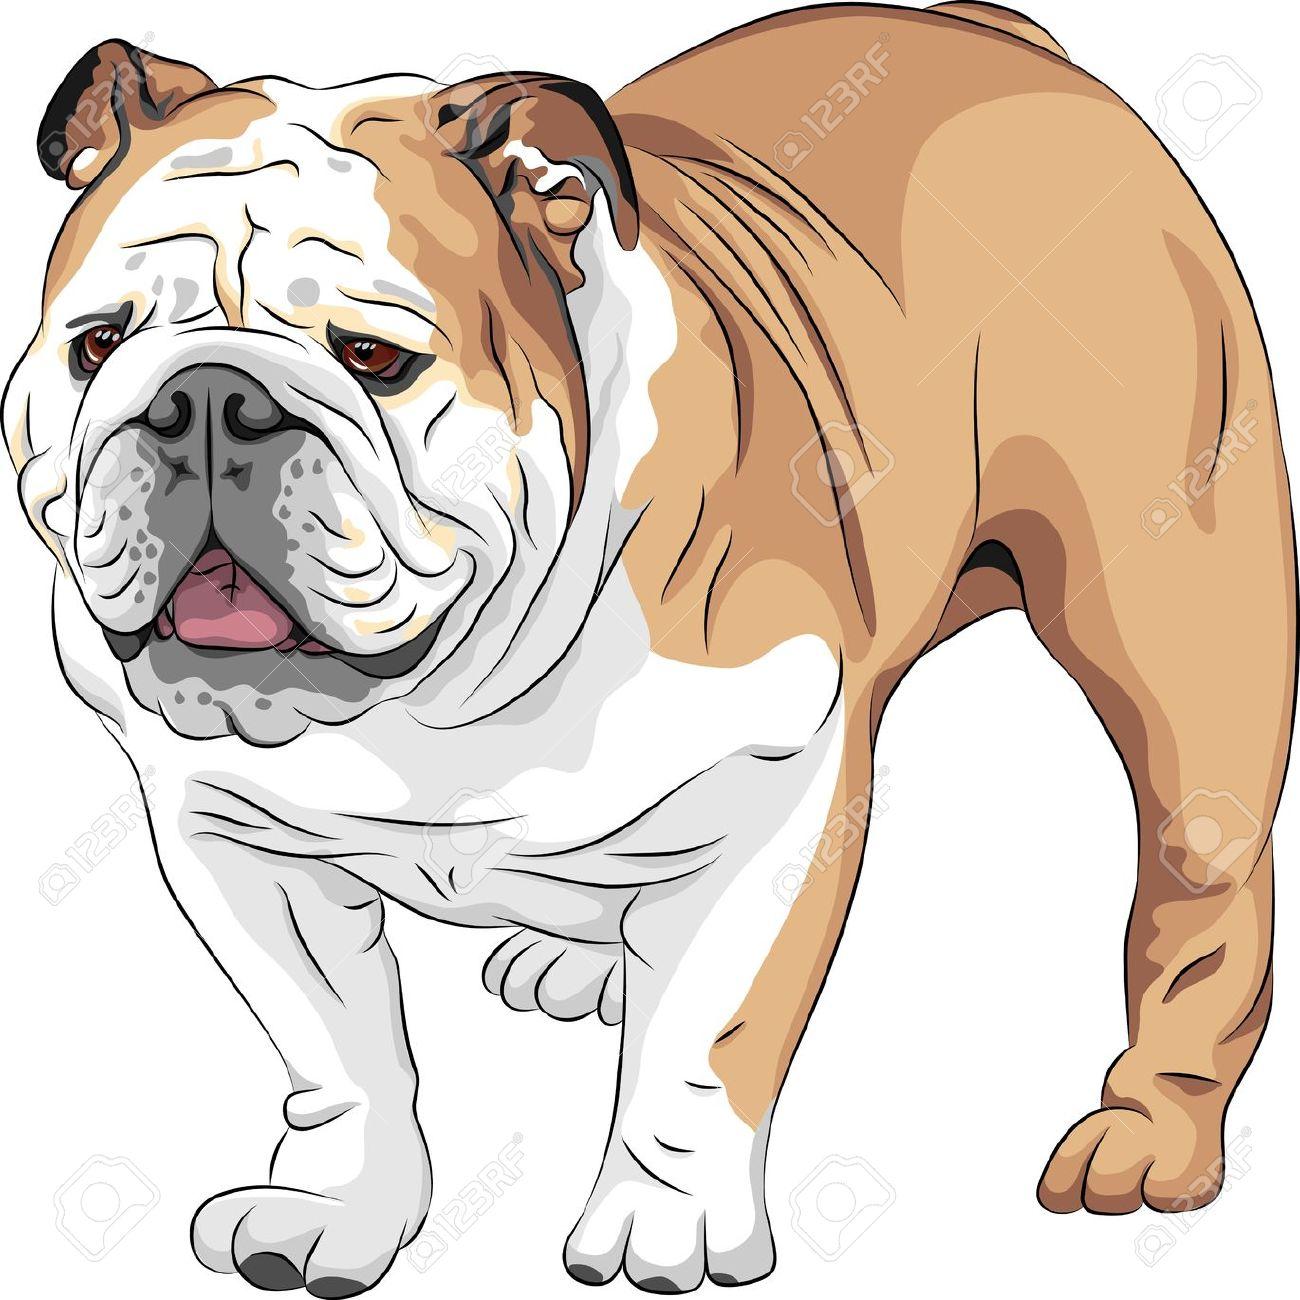 COLOR Sketch Of The Dog English Bulldog Breed Royalty Free.